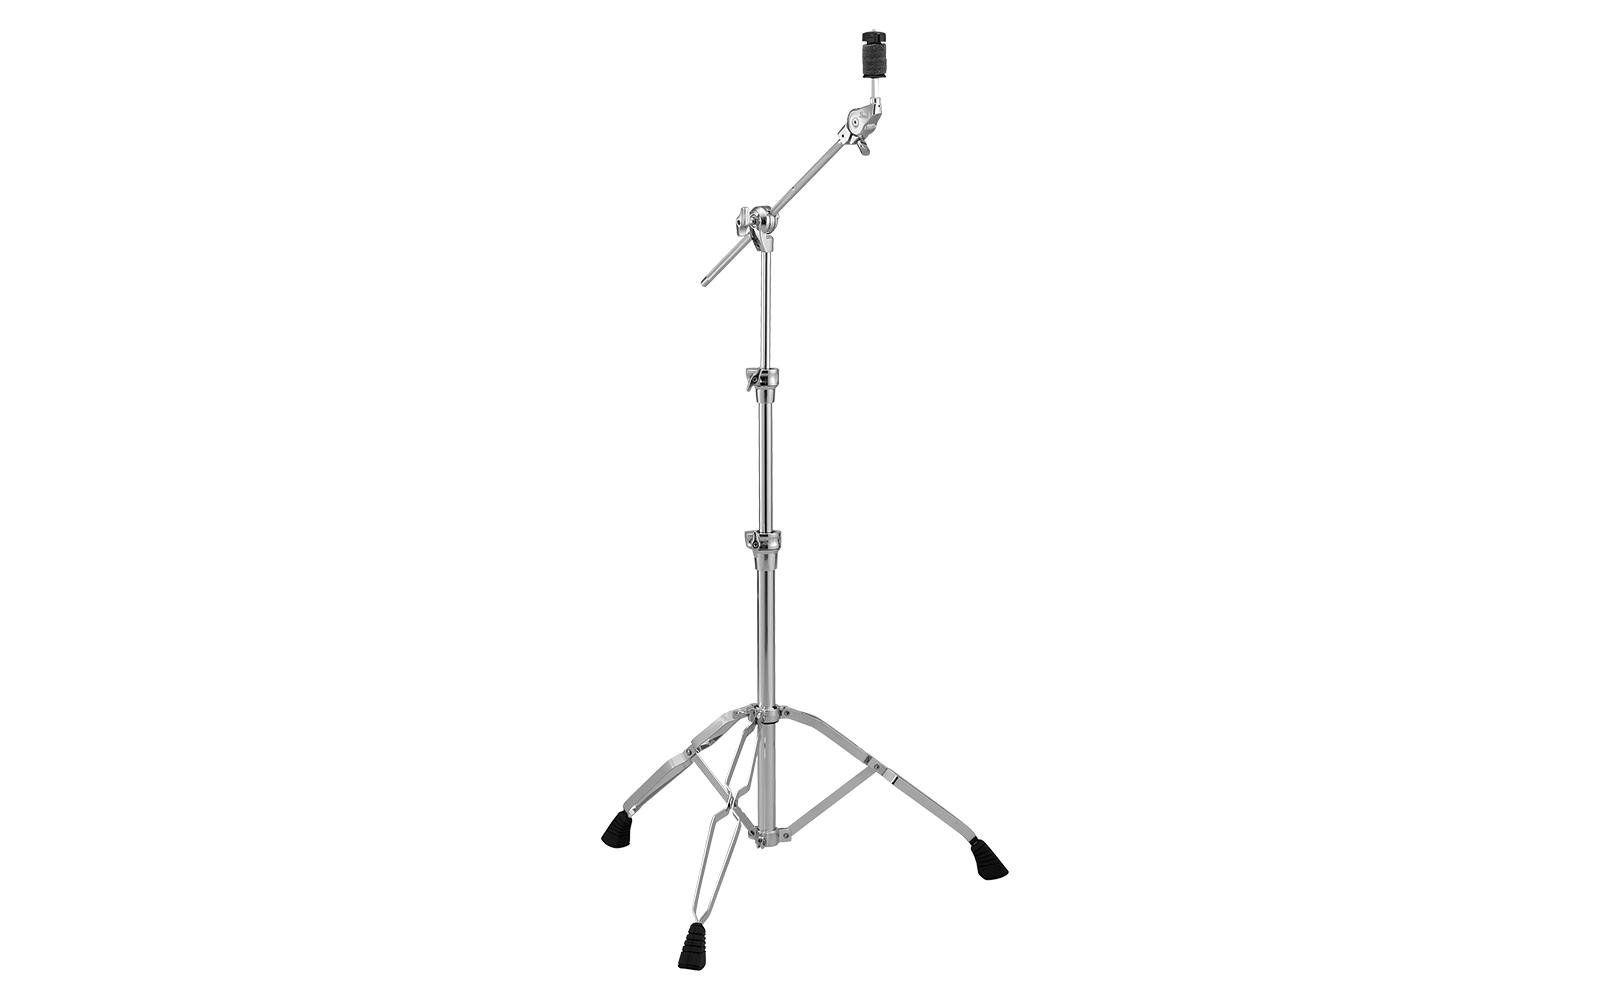 Pearl BC-930 Cymbal Boom Stand, Uni-Lock Tilter